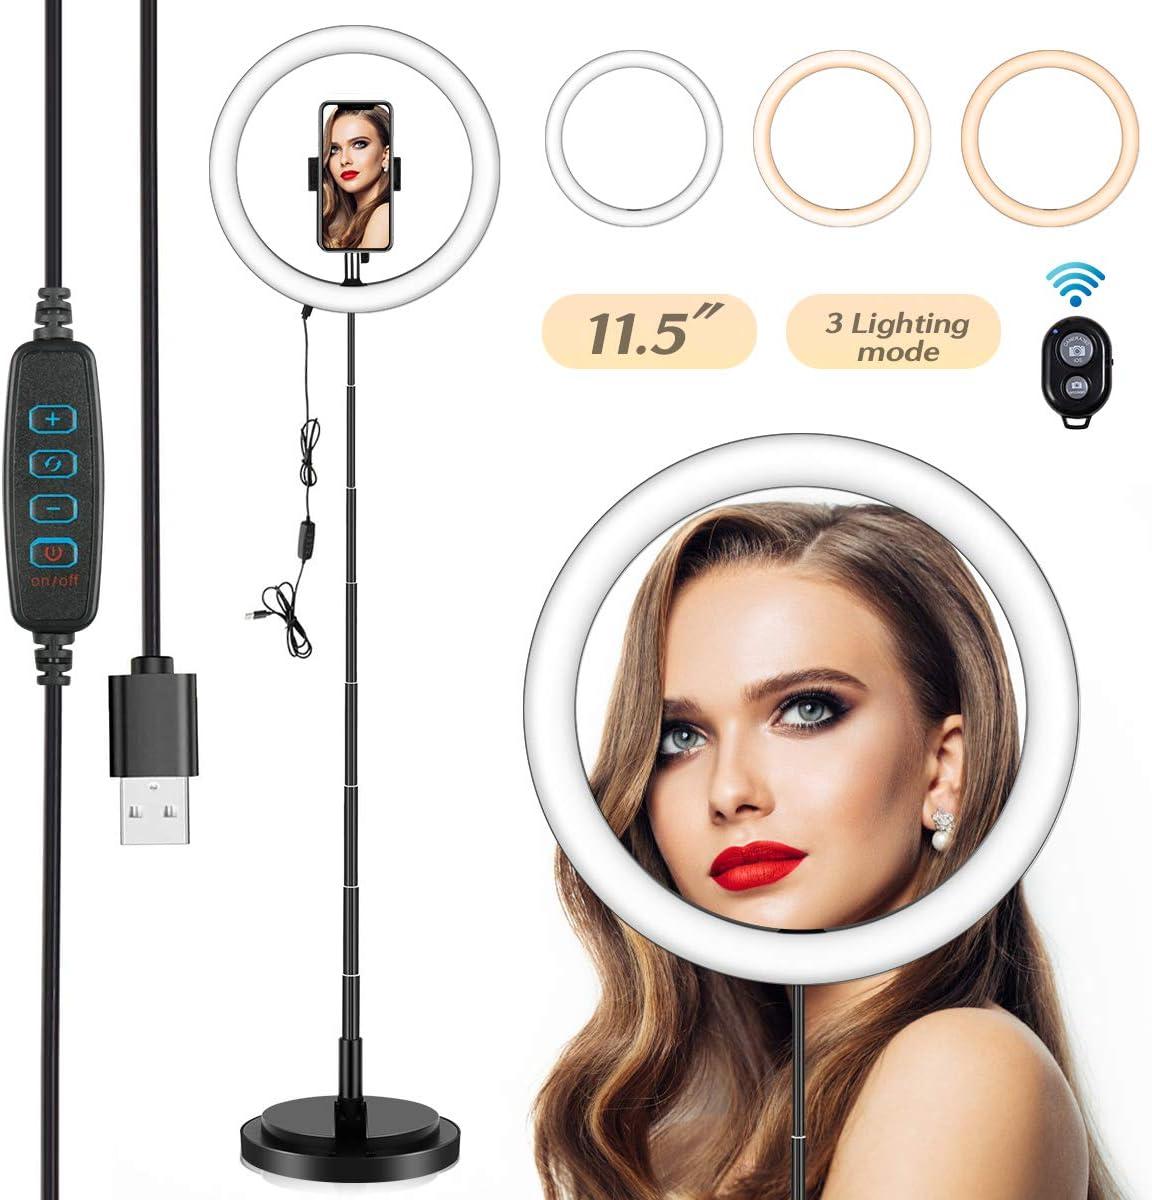 3500K-6000K 5500K Dimmbare Bluetooth-Empf/änger f/ür YouTube Vine Self-Portr/ät der Videoaufnahme 3500K-6000K dimmbare 3 Farbmodi 11.5// 29 cm Selfie Ringleuchte Licht